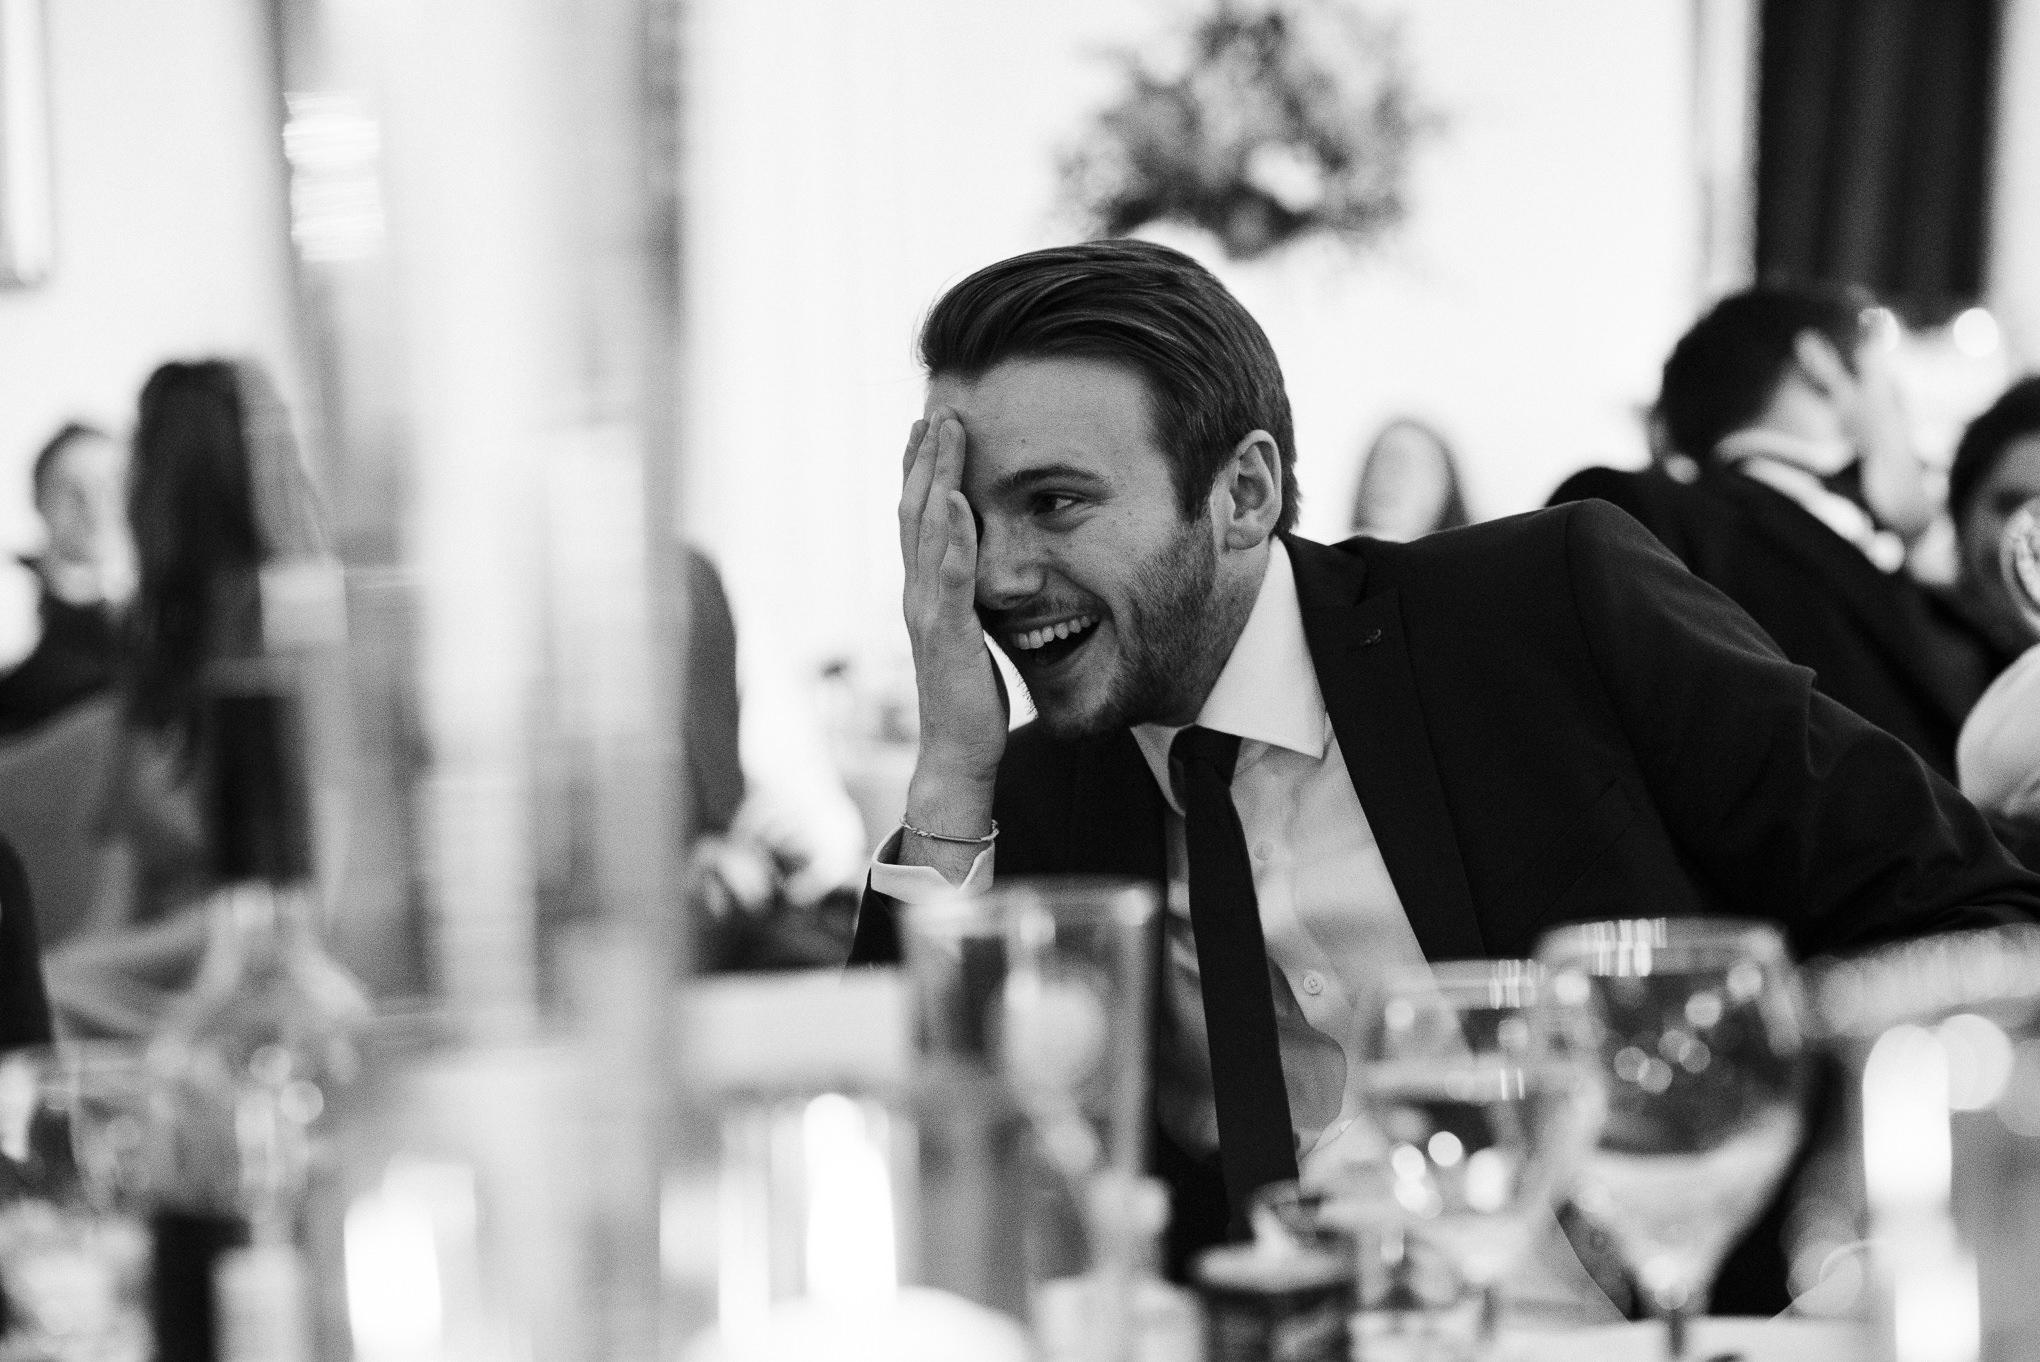 20170422_euan robertson weddings_088.jpg